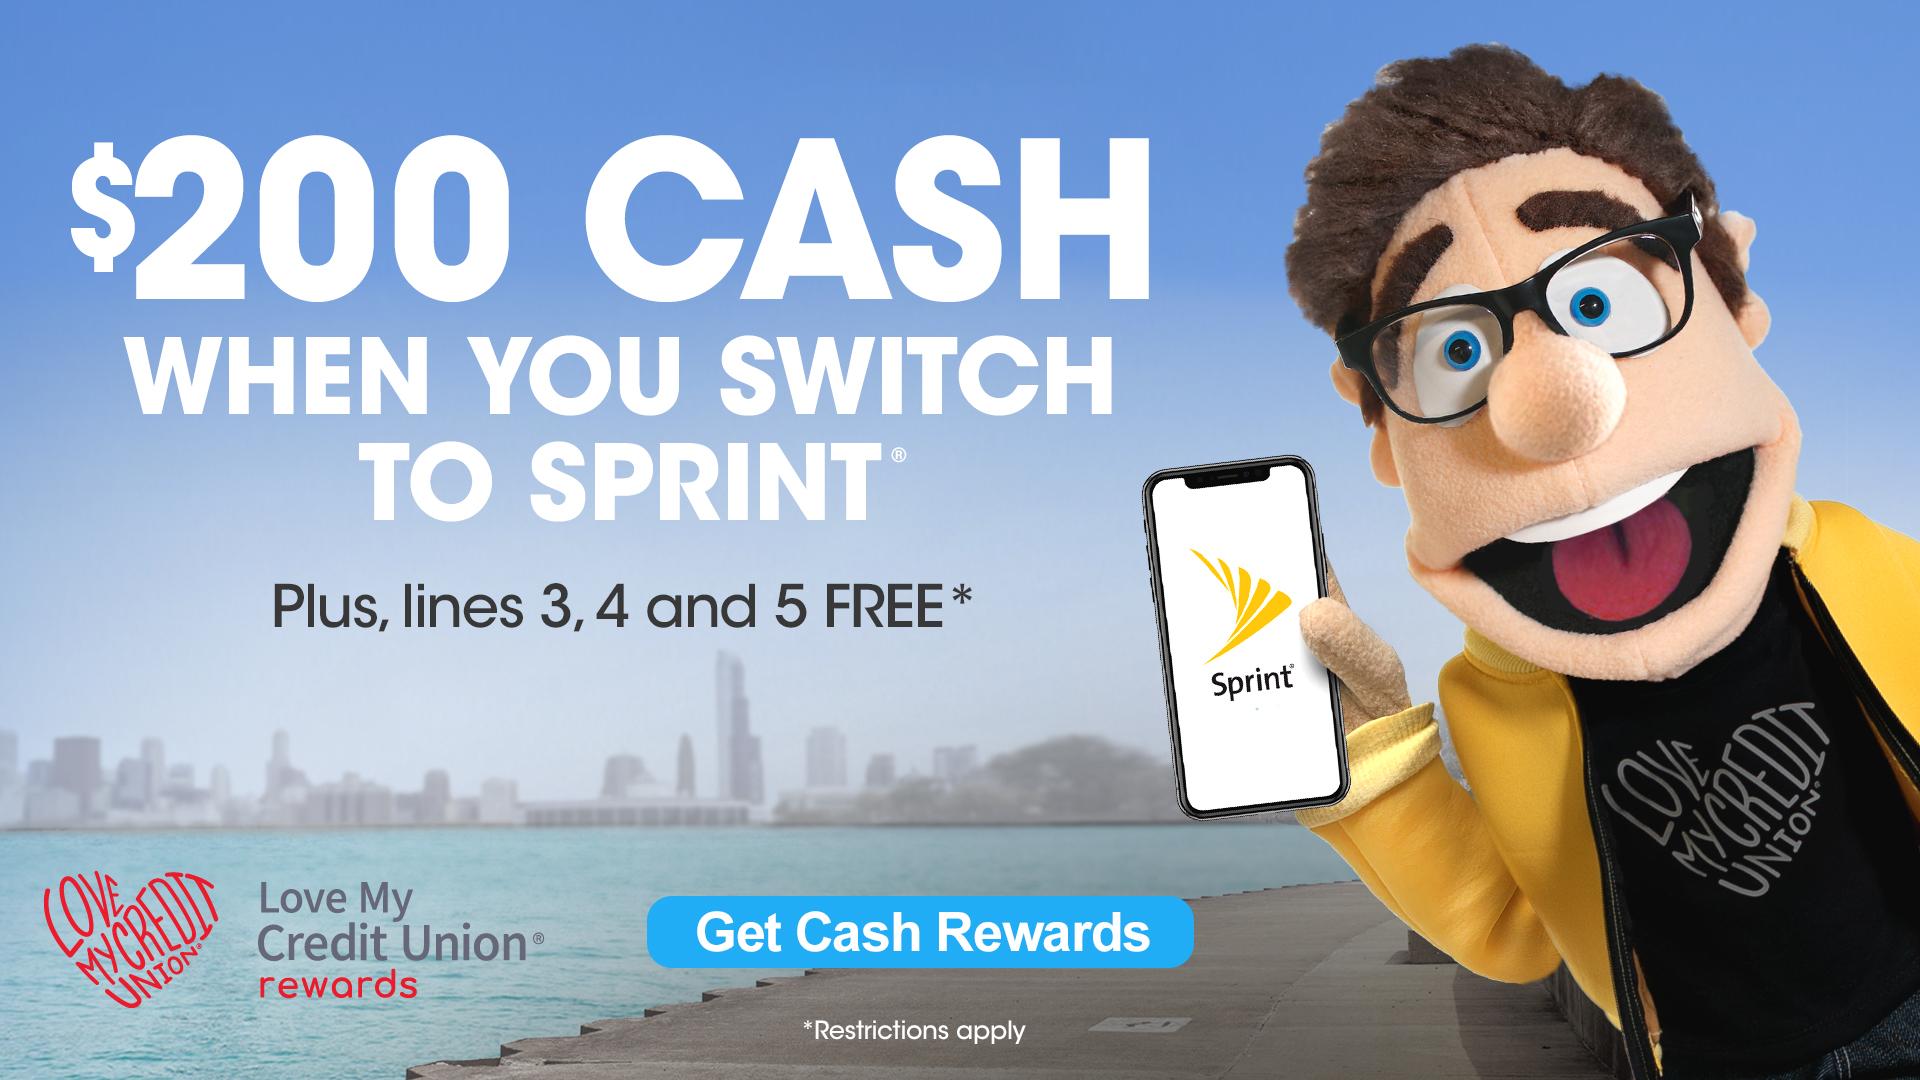 Sprint new customer offer